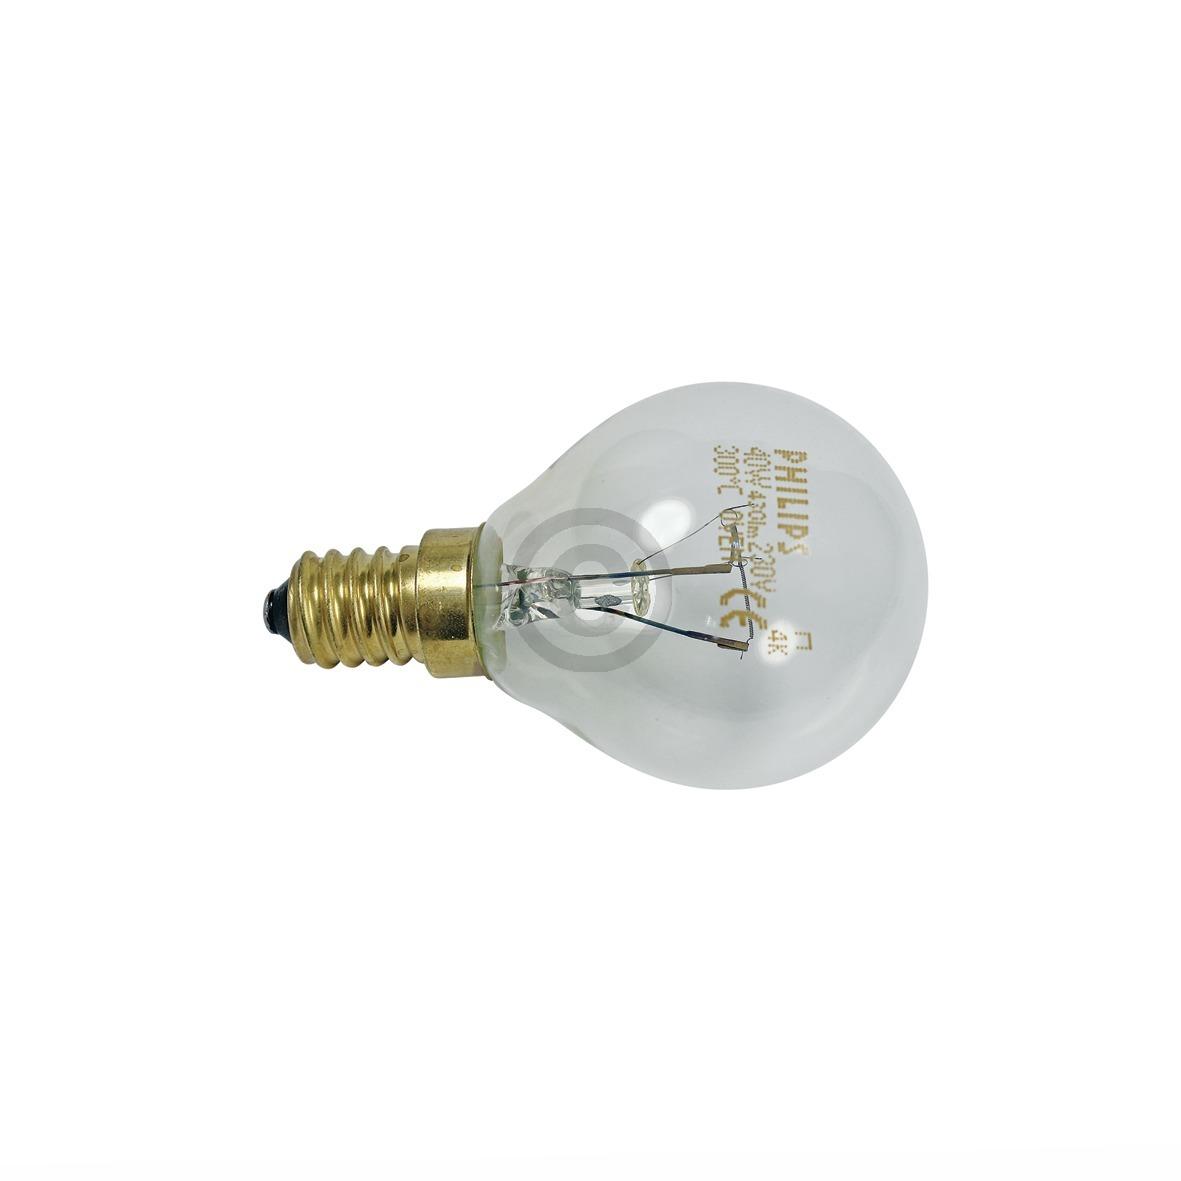 Lampe E14 40W Bosch 00057874 45mmØ 76mm 220/230V Kugelform Universal